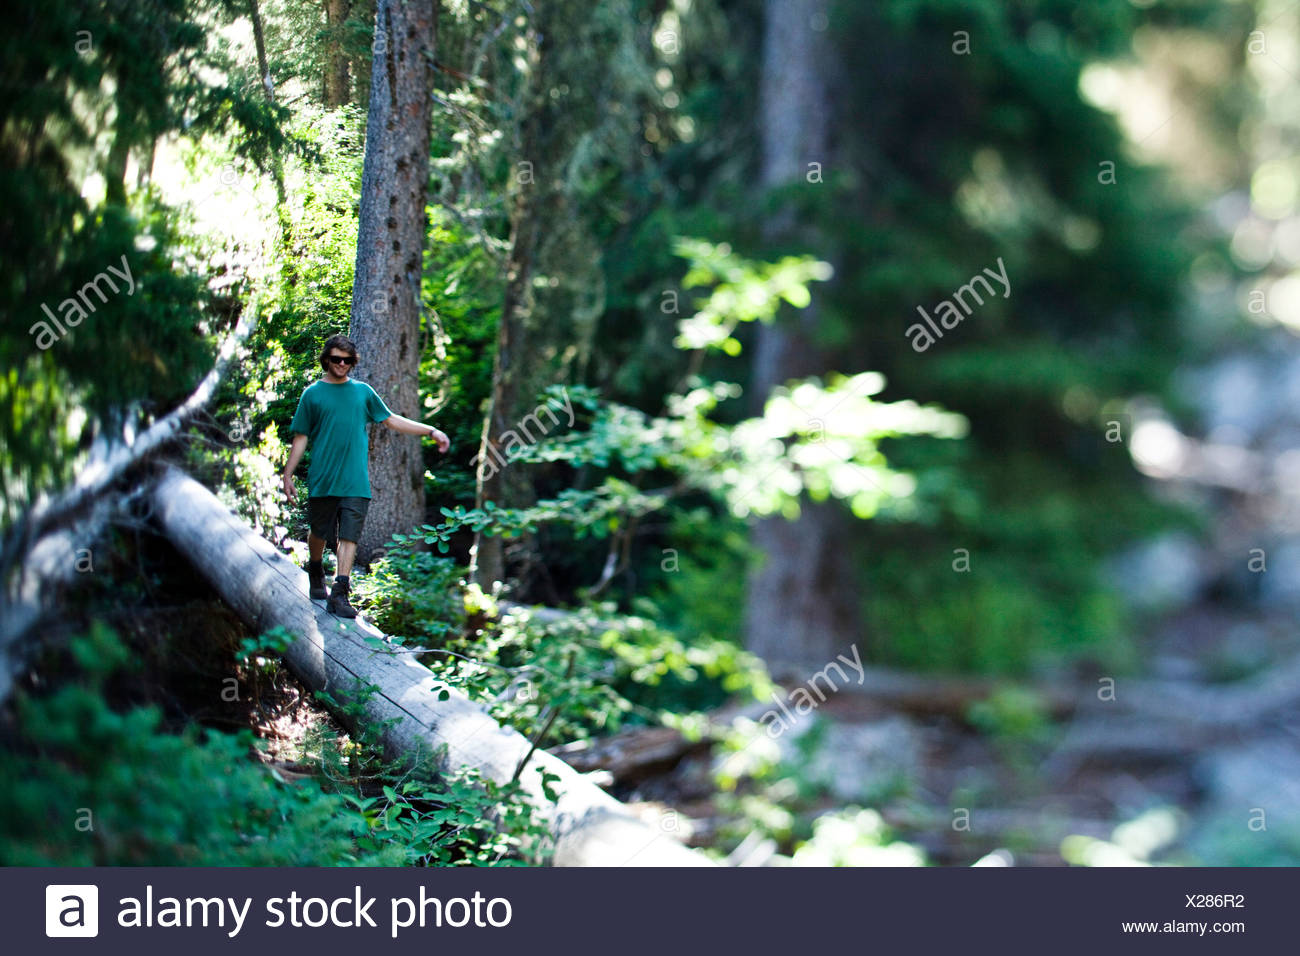 A young man hiking walks across a fallen log in Wyoming. Stock Photo